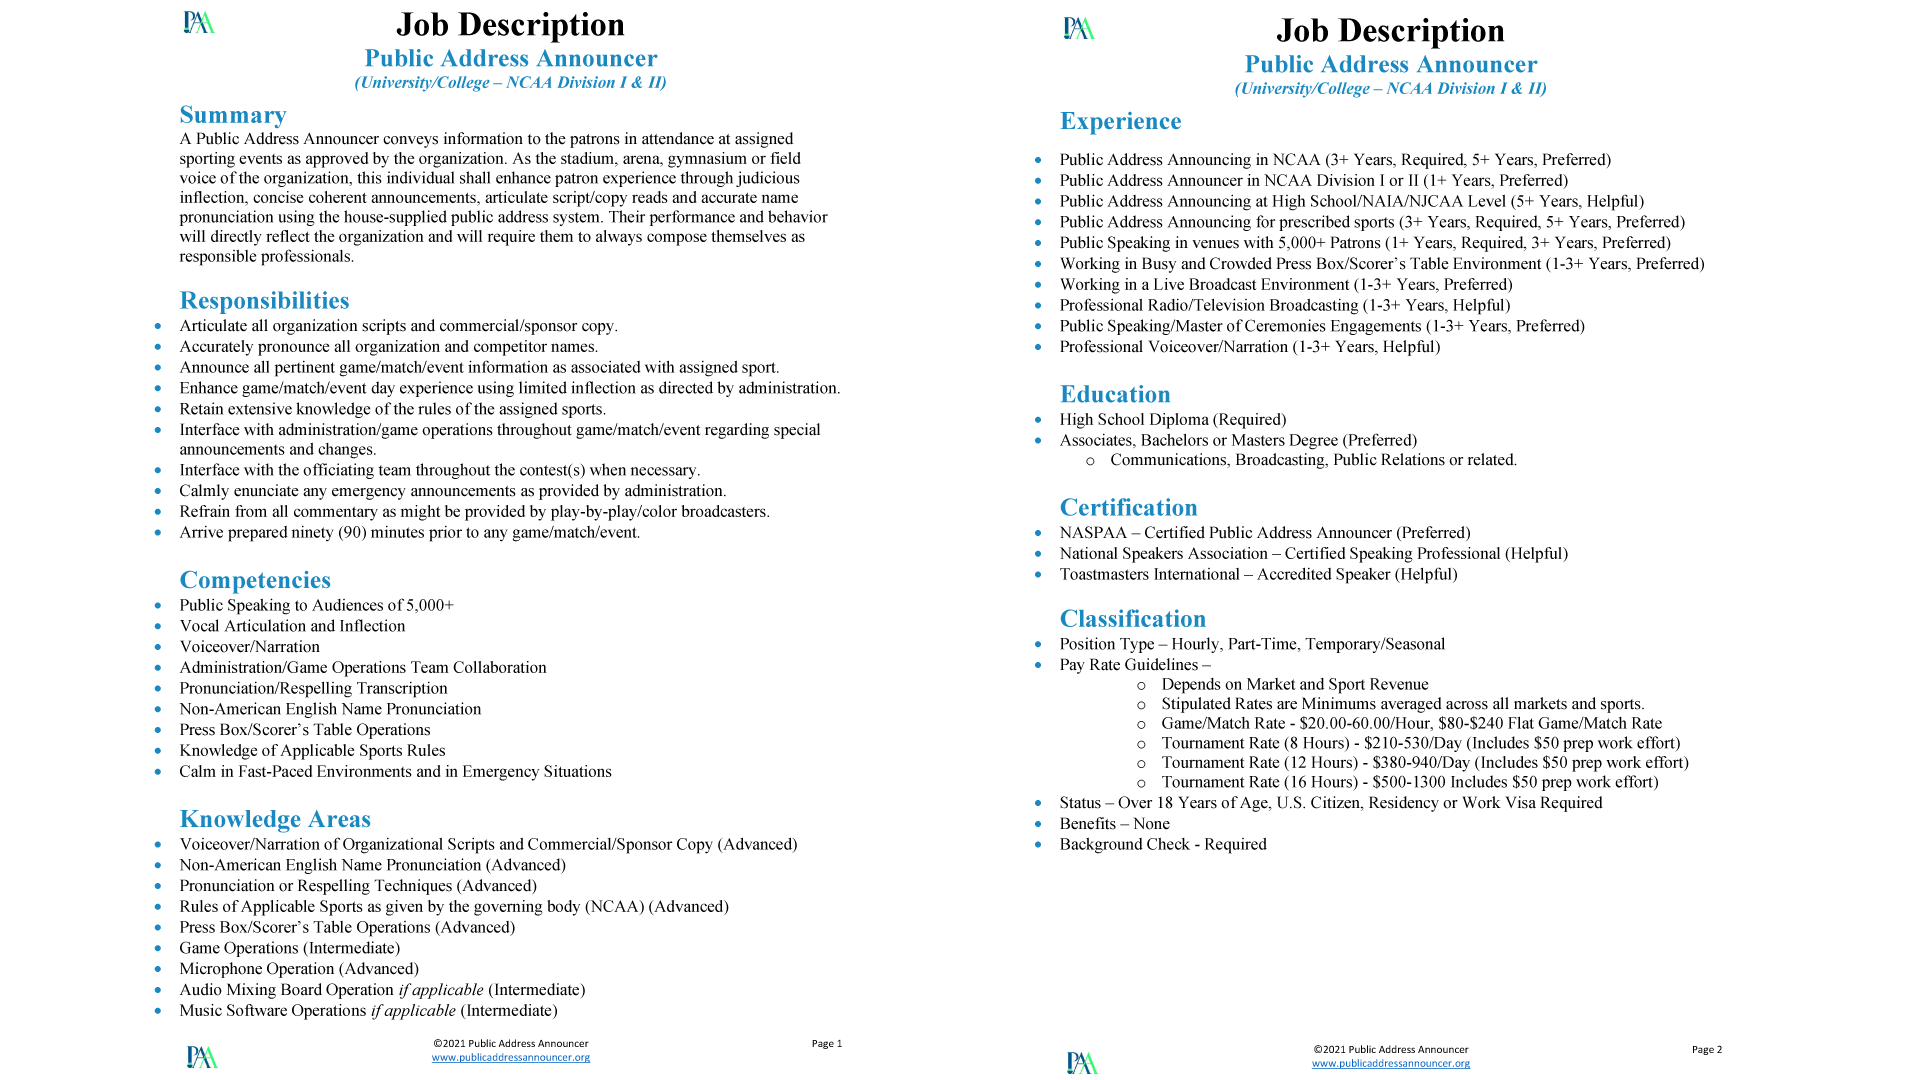 Job Description - Public Address Announcer - University - NCAA